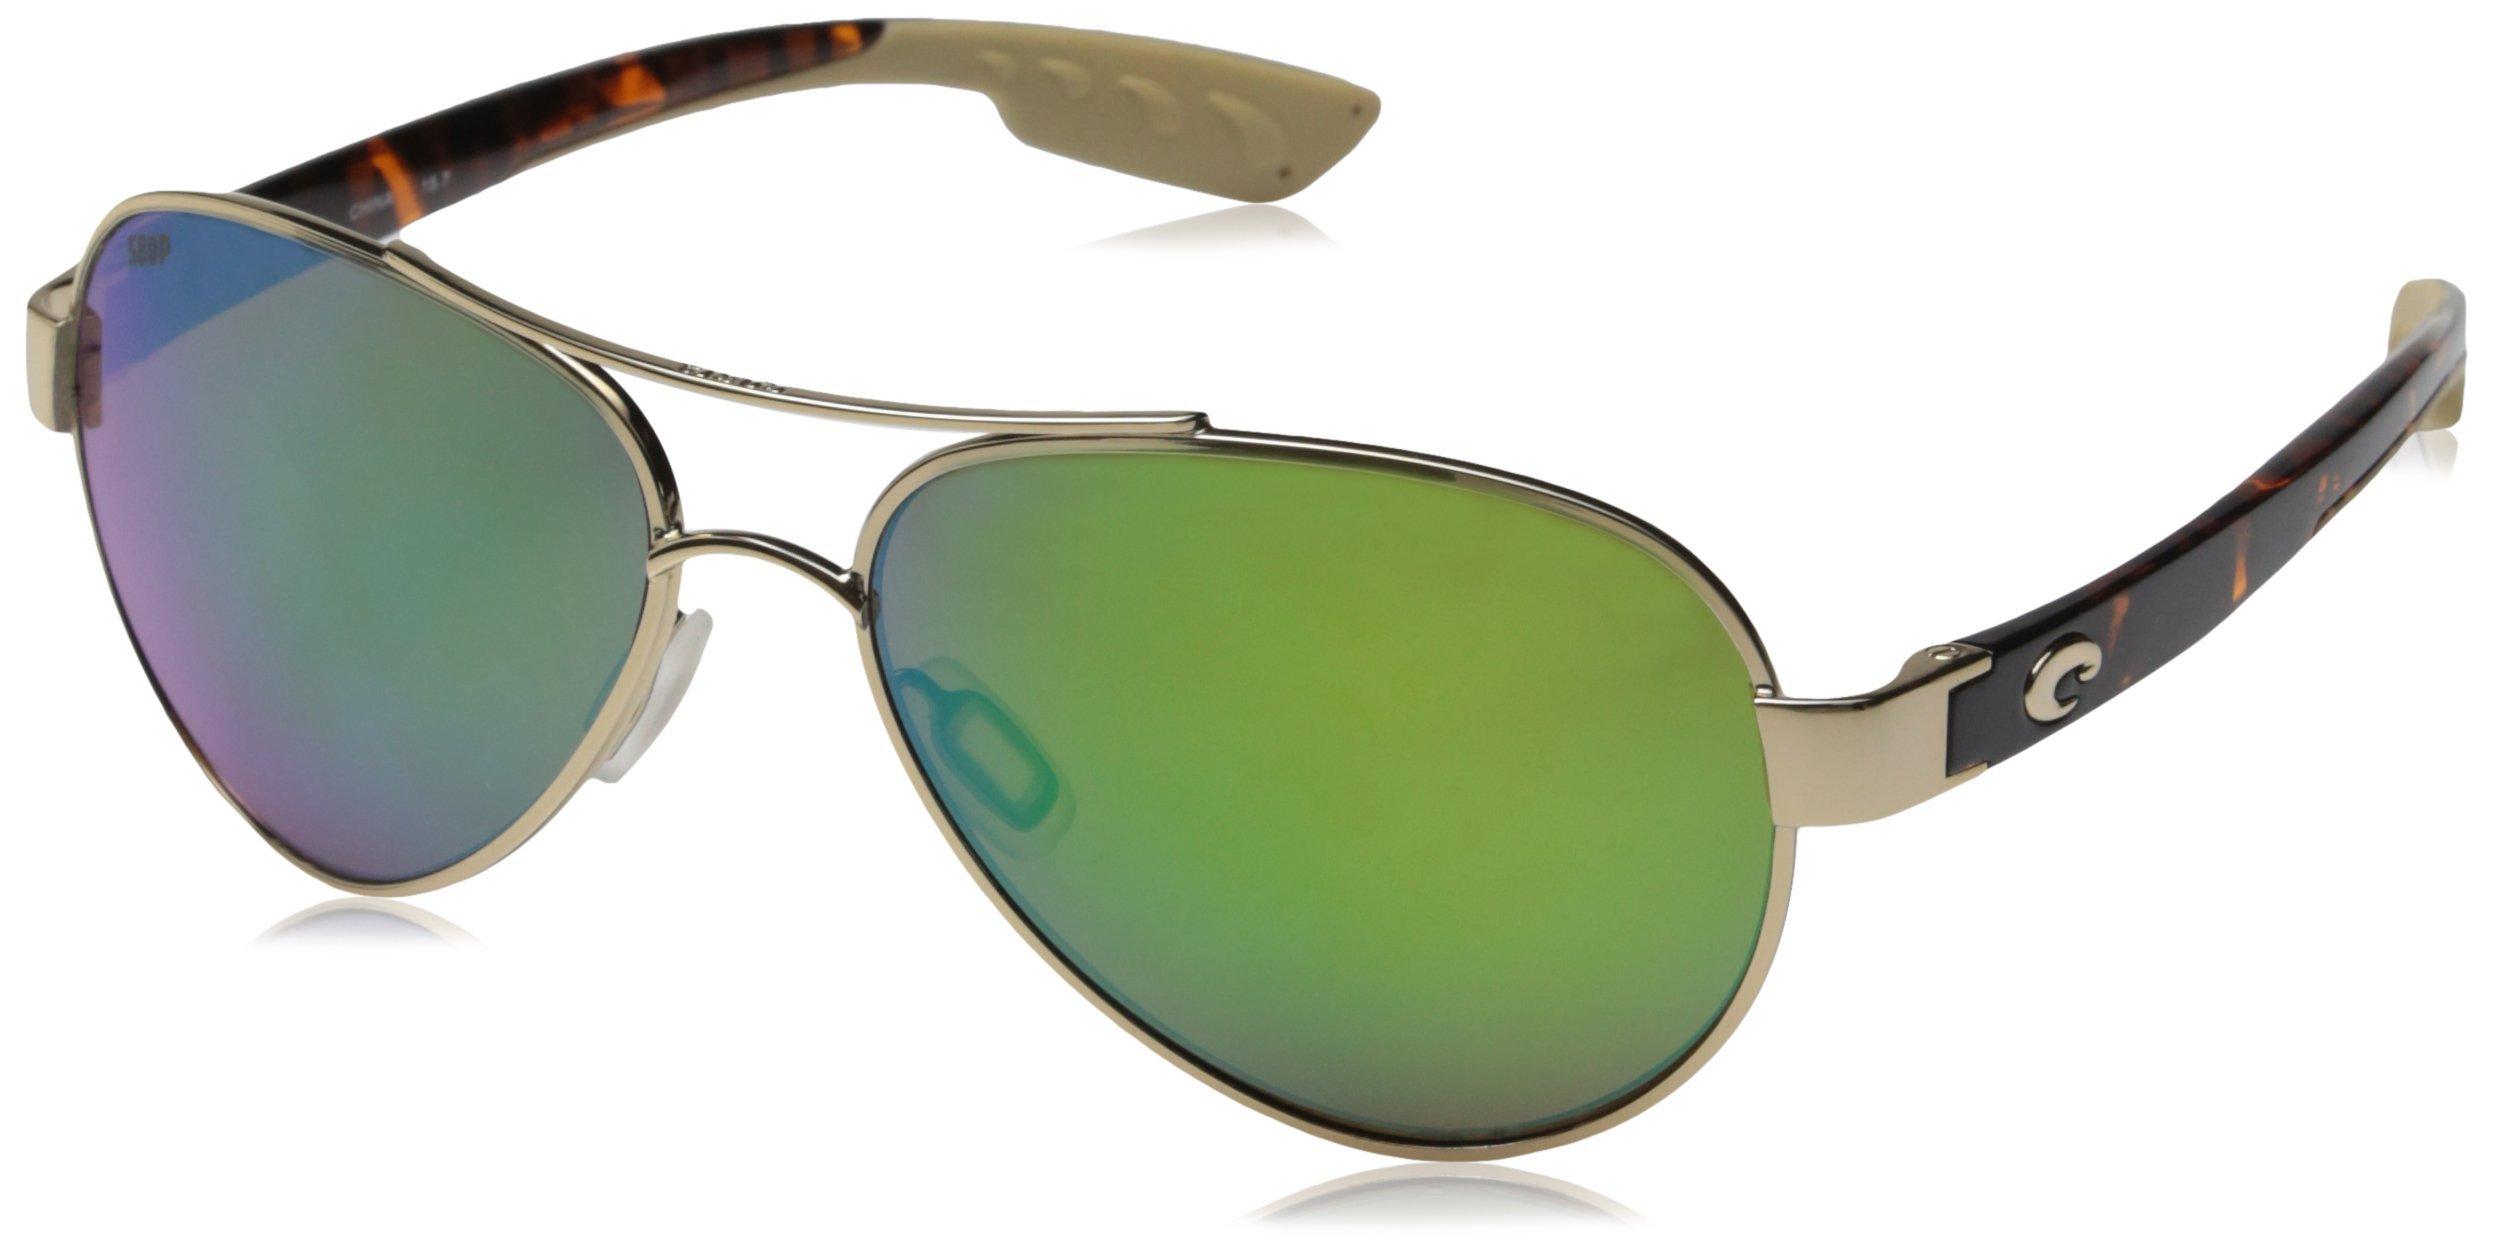 Costa del Mar Unisex-Adult Loreto LR 64 OGMP Polarized Iridium Aviator Sunglasses, Rose Gold, 56.5 mm by Costa del Mar